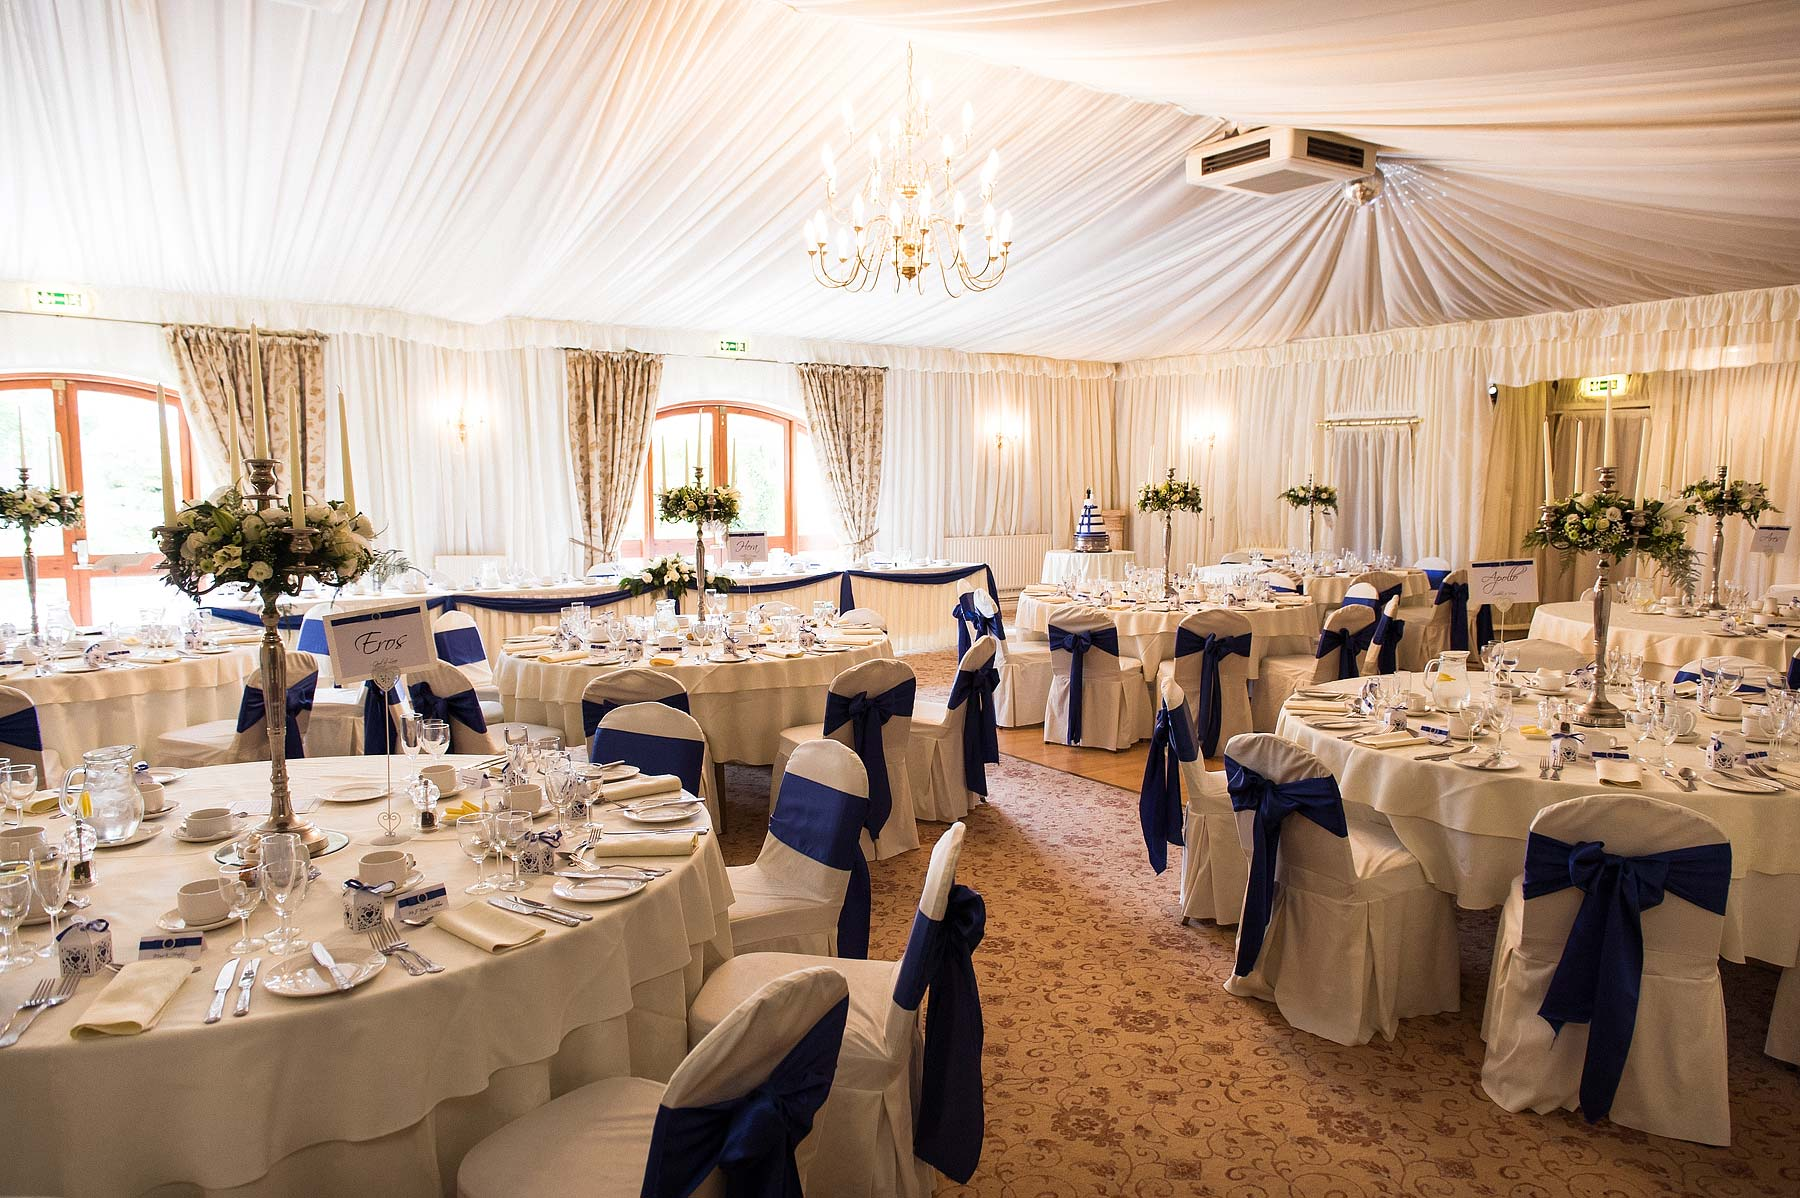 albright-hussey-manor-wedding-photographers-055